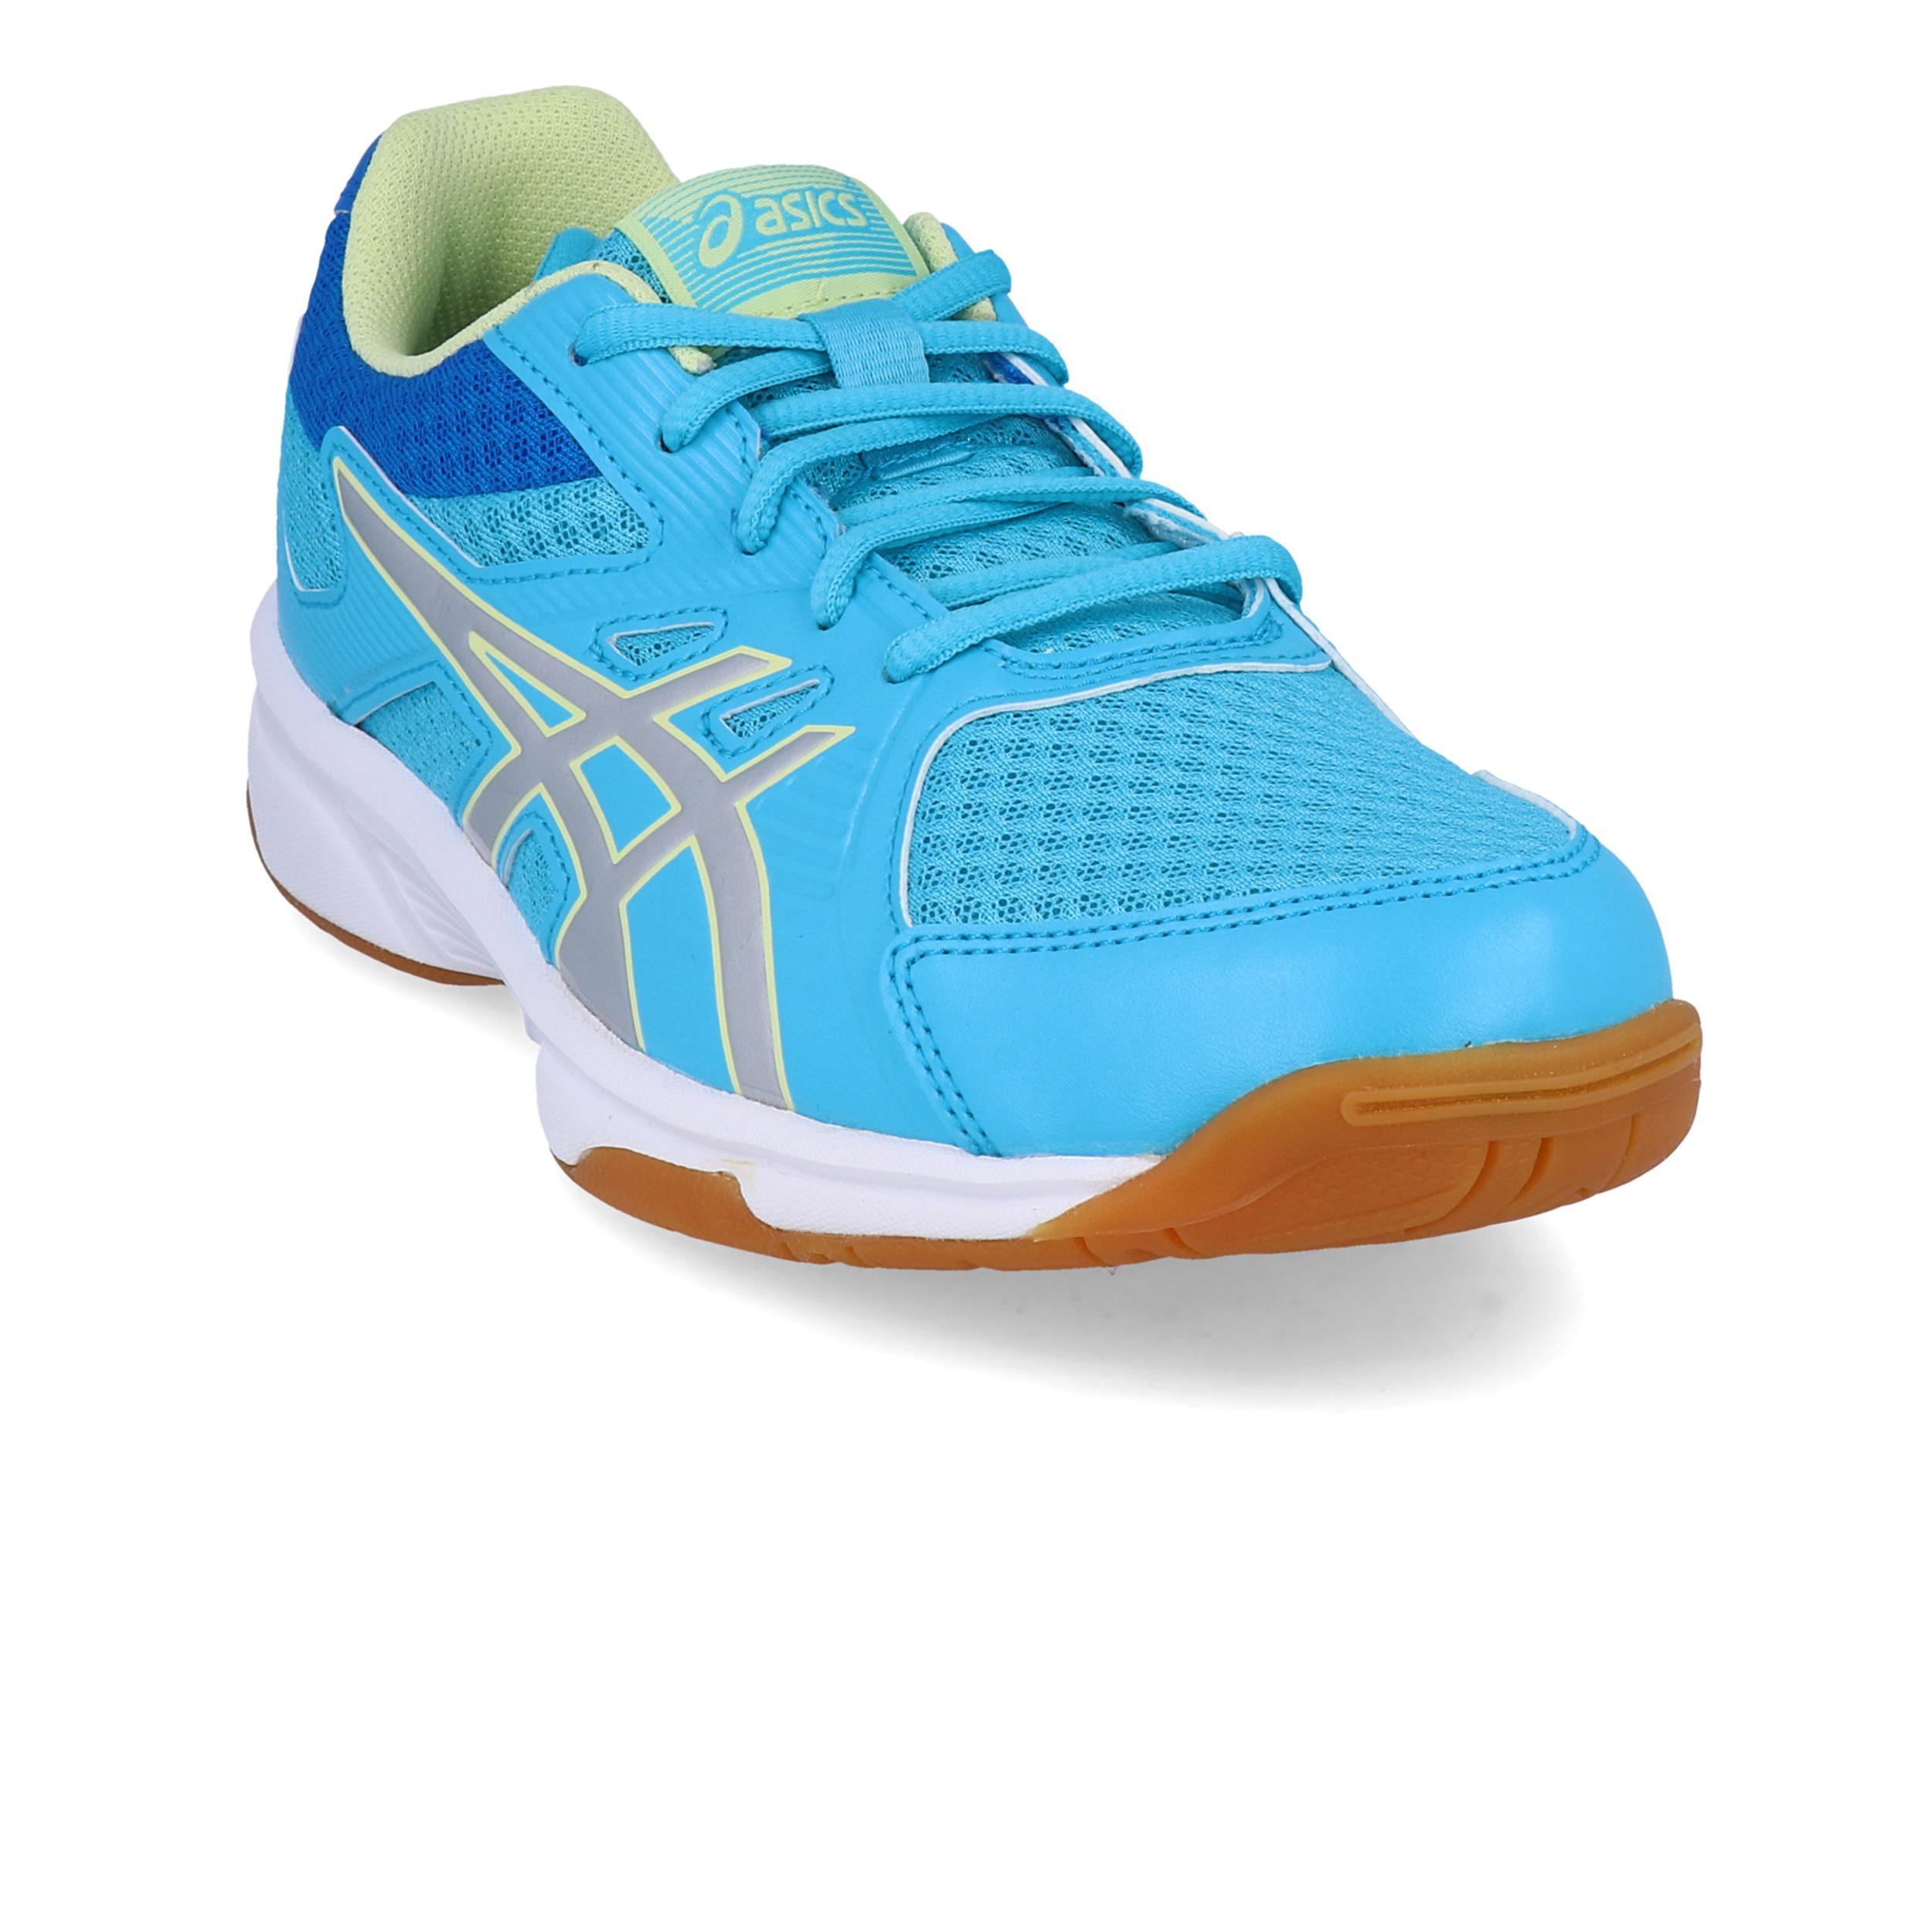 Asics Junior Pre-Upcourt PS Indoor Court Shoes Purple Sports Handball Trainers